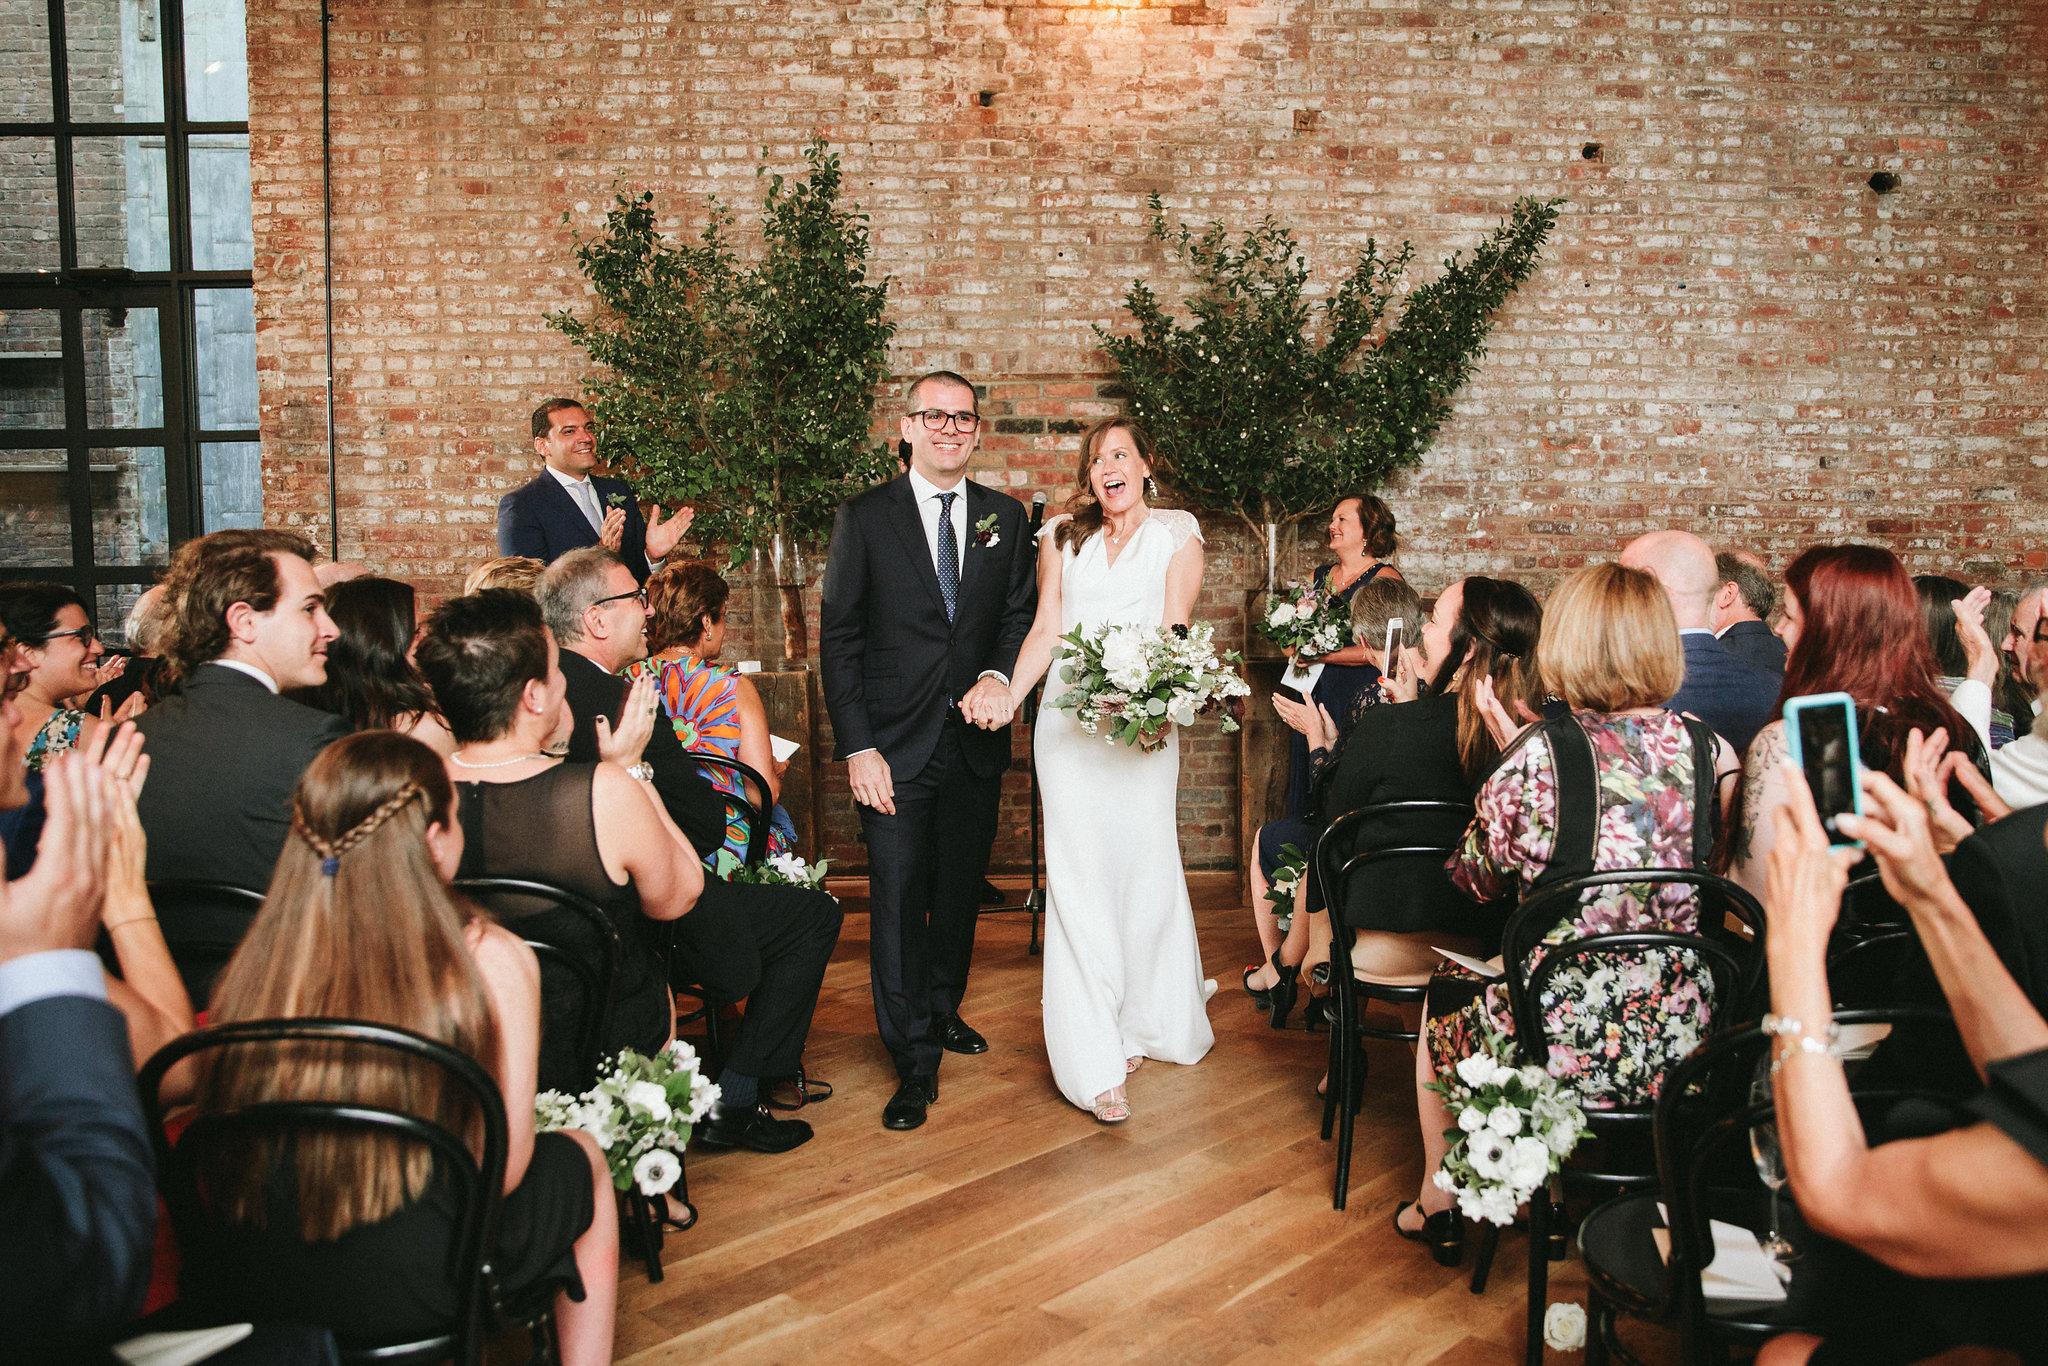 S+M-wythe-wedding-jove-meyer-events-0117.jpg